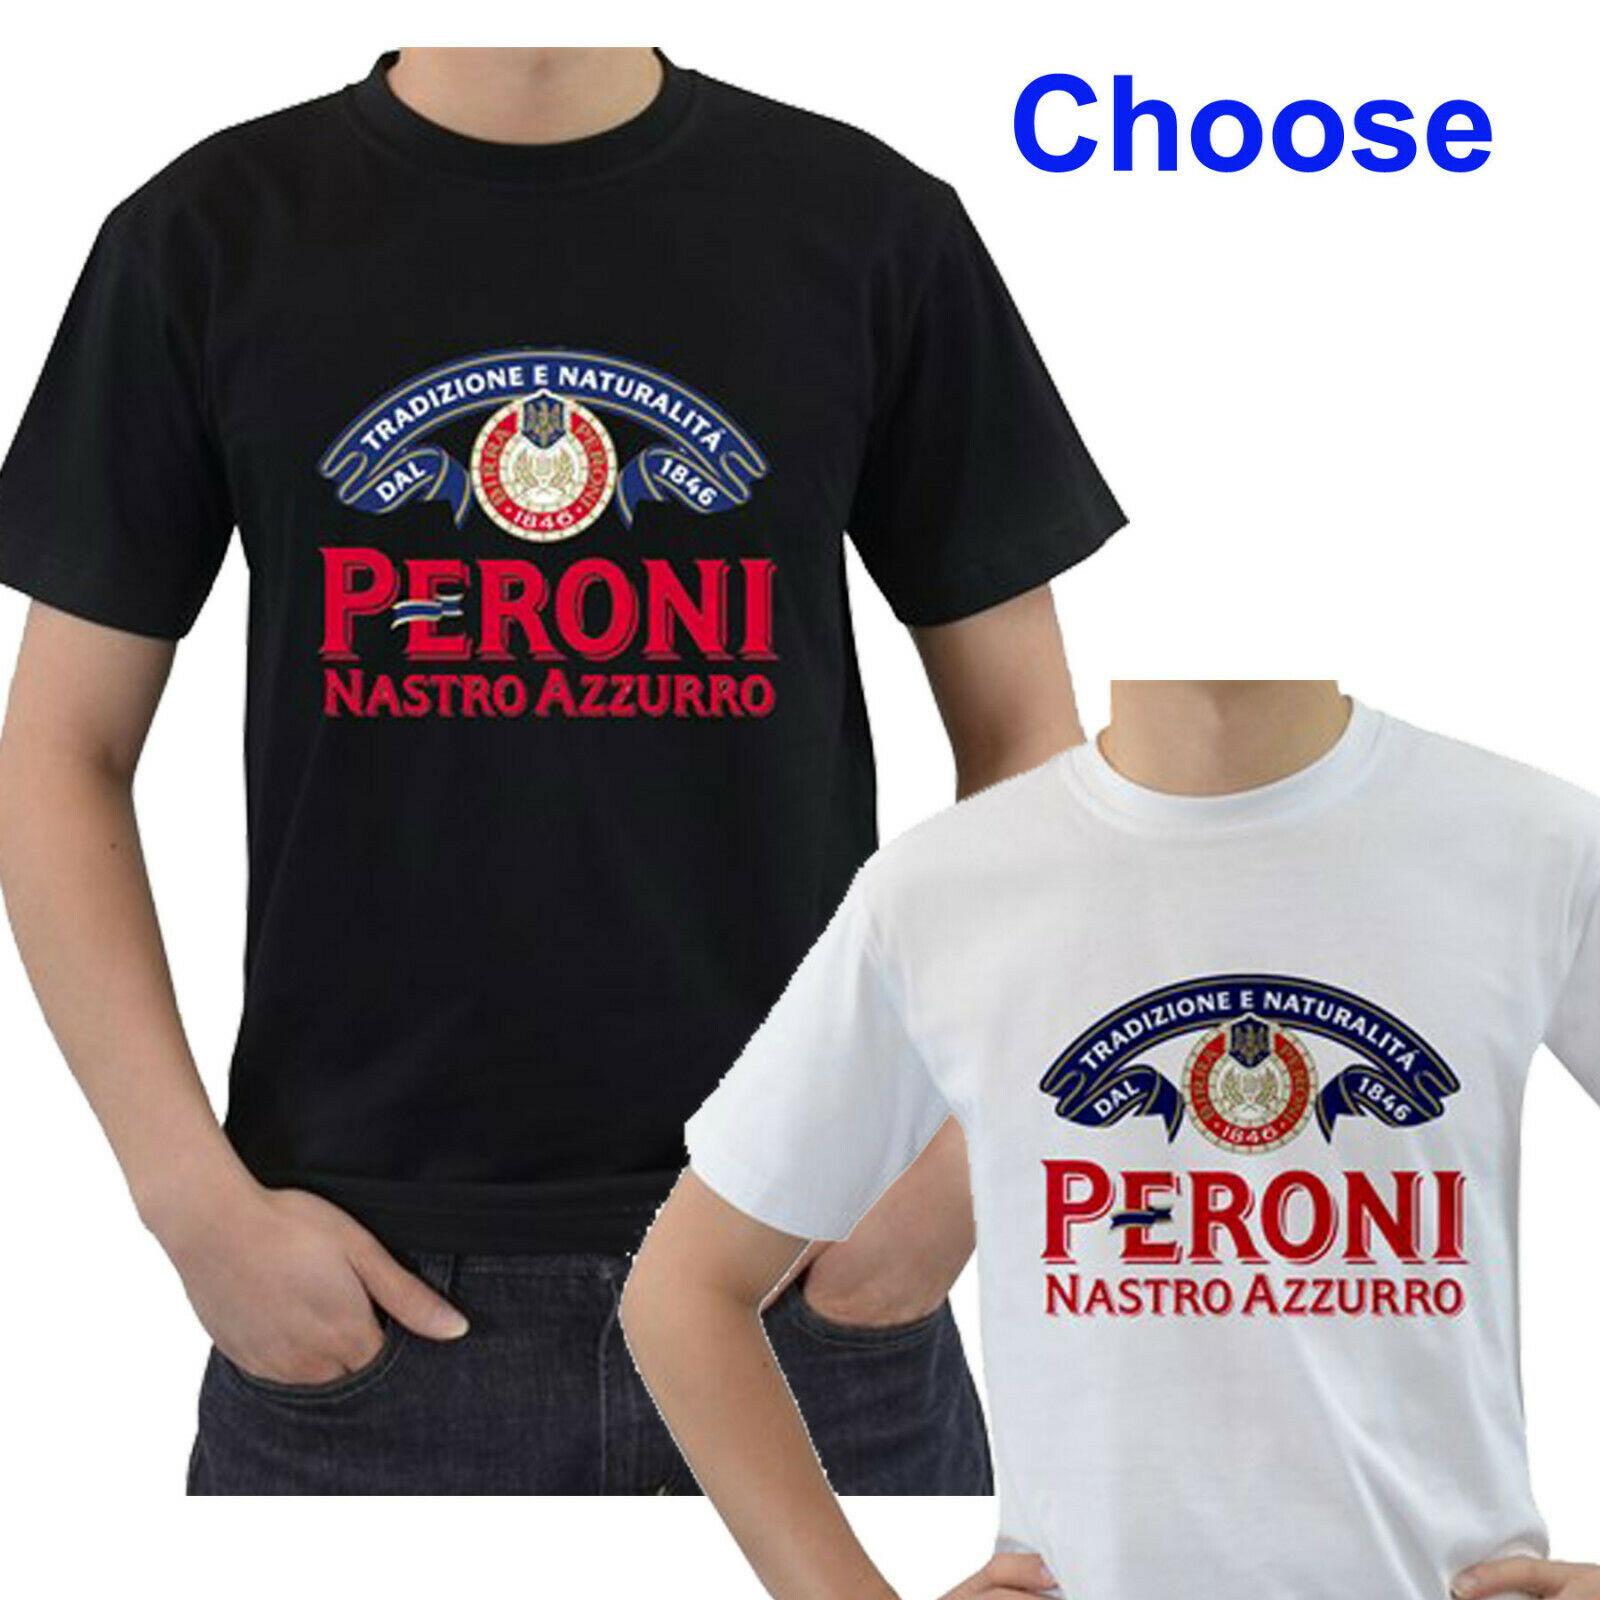 ¡Nuevo! Camiseta Unisex con Logo de Peroni Nastro Azzurro, cerveza italiana, blanco